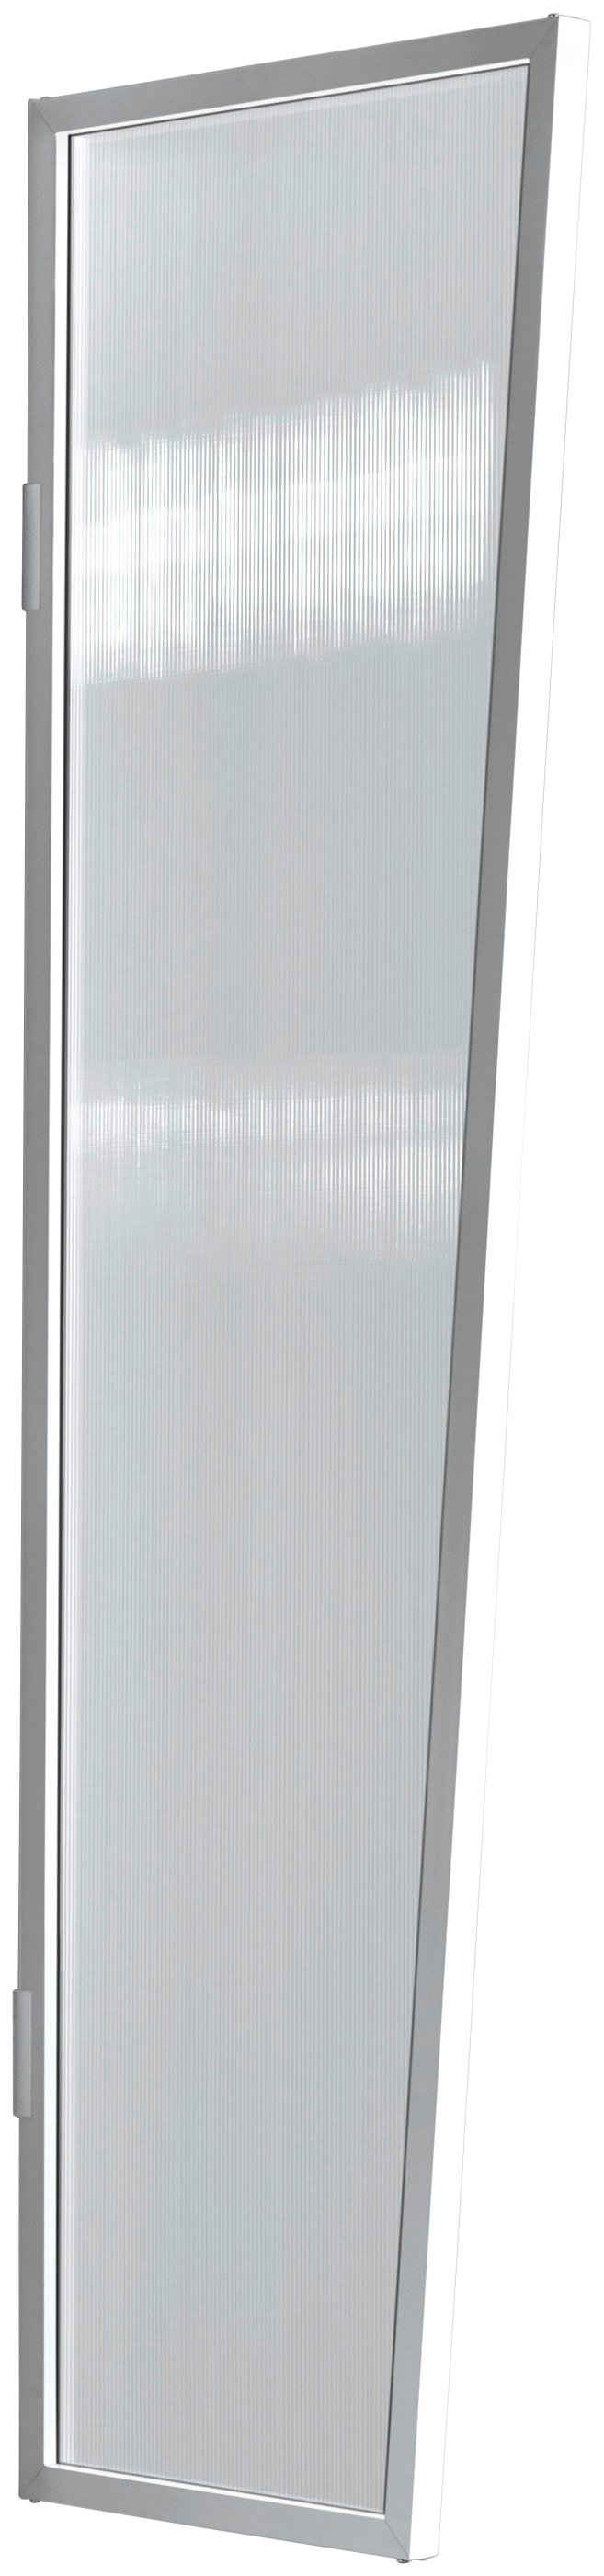 GUTTA Seitenblende »B1 PC klar«, TxH: 45-60x200 cm